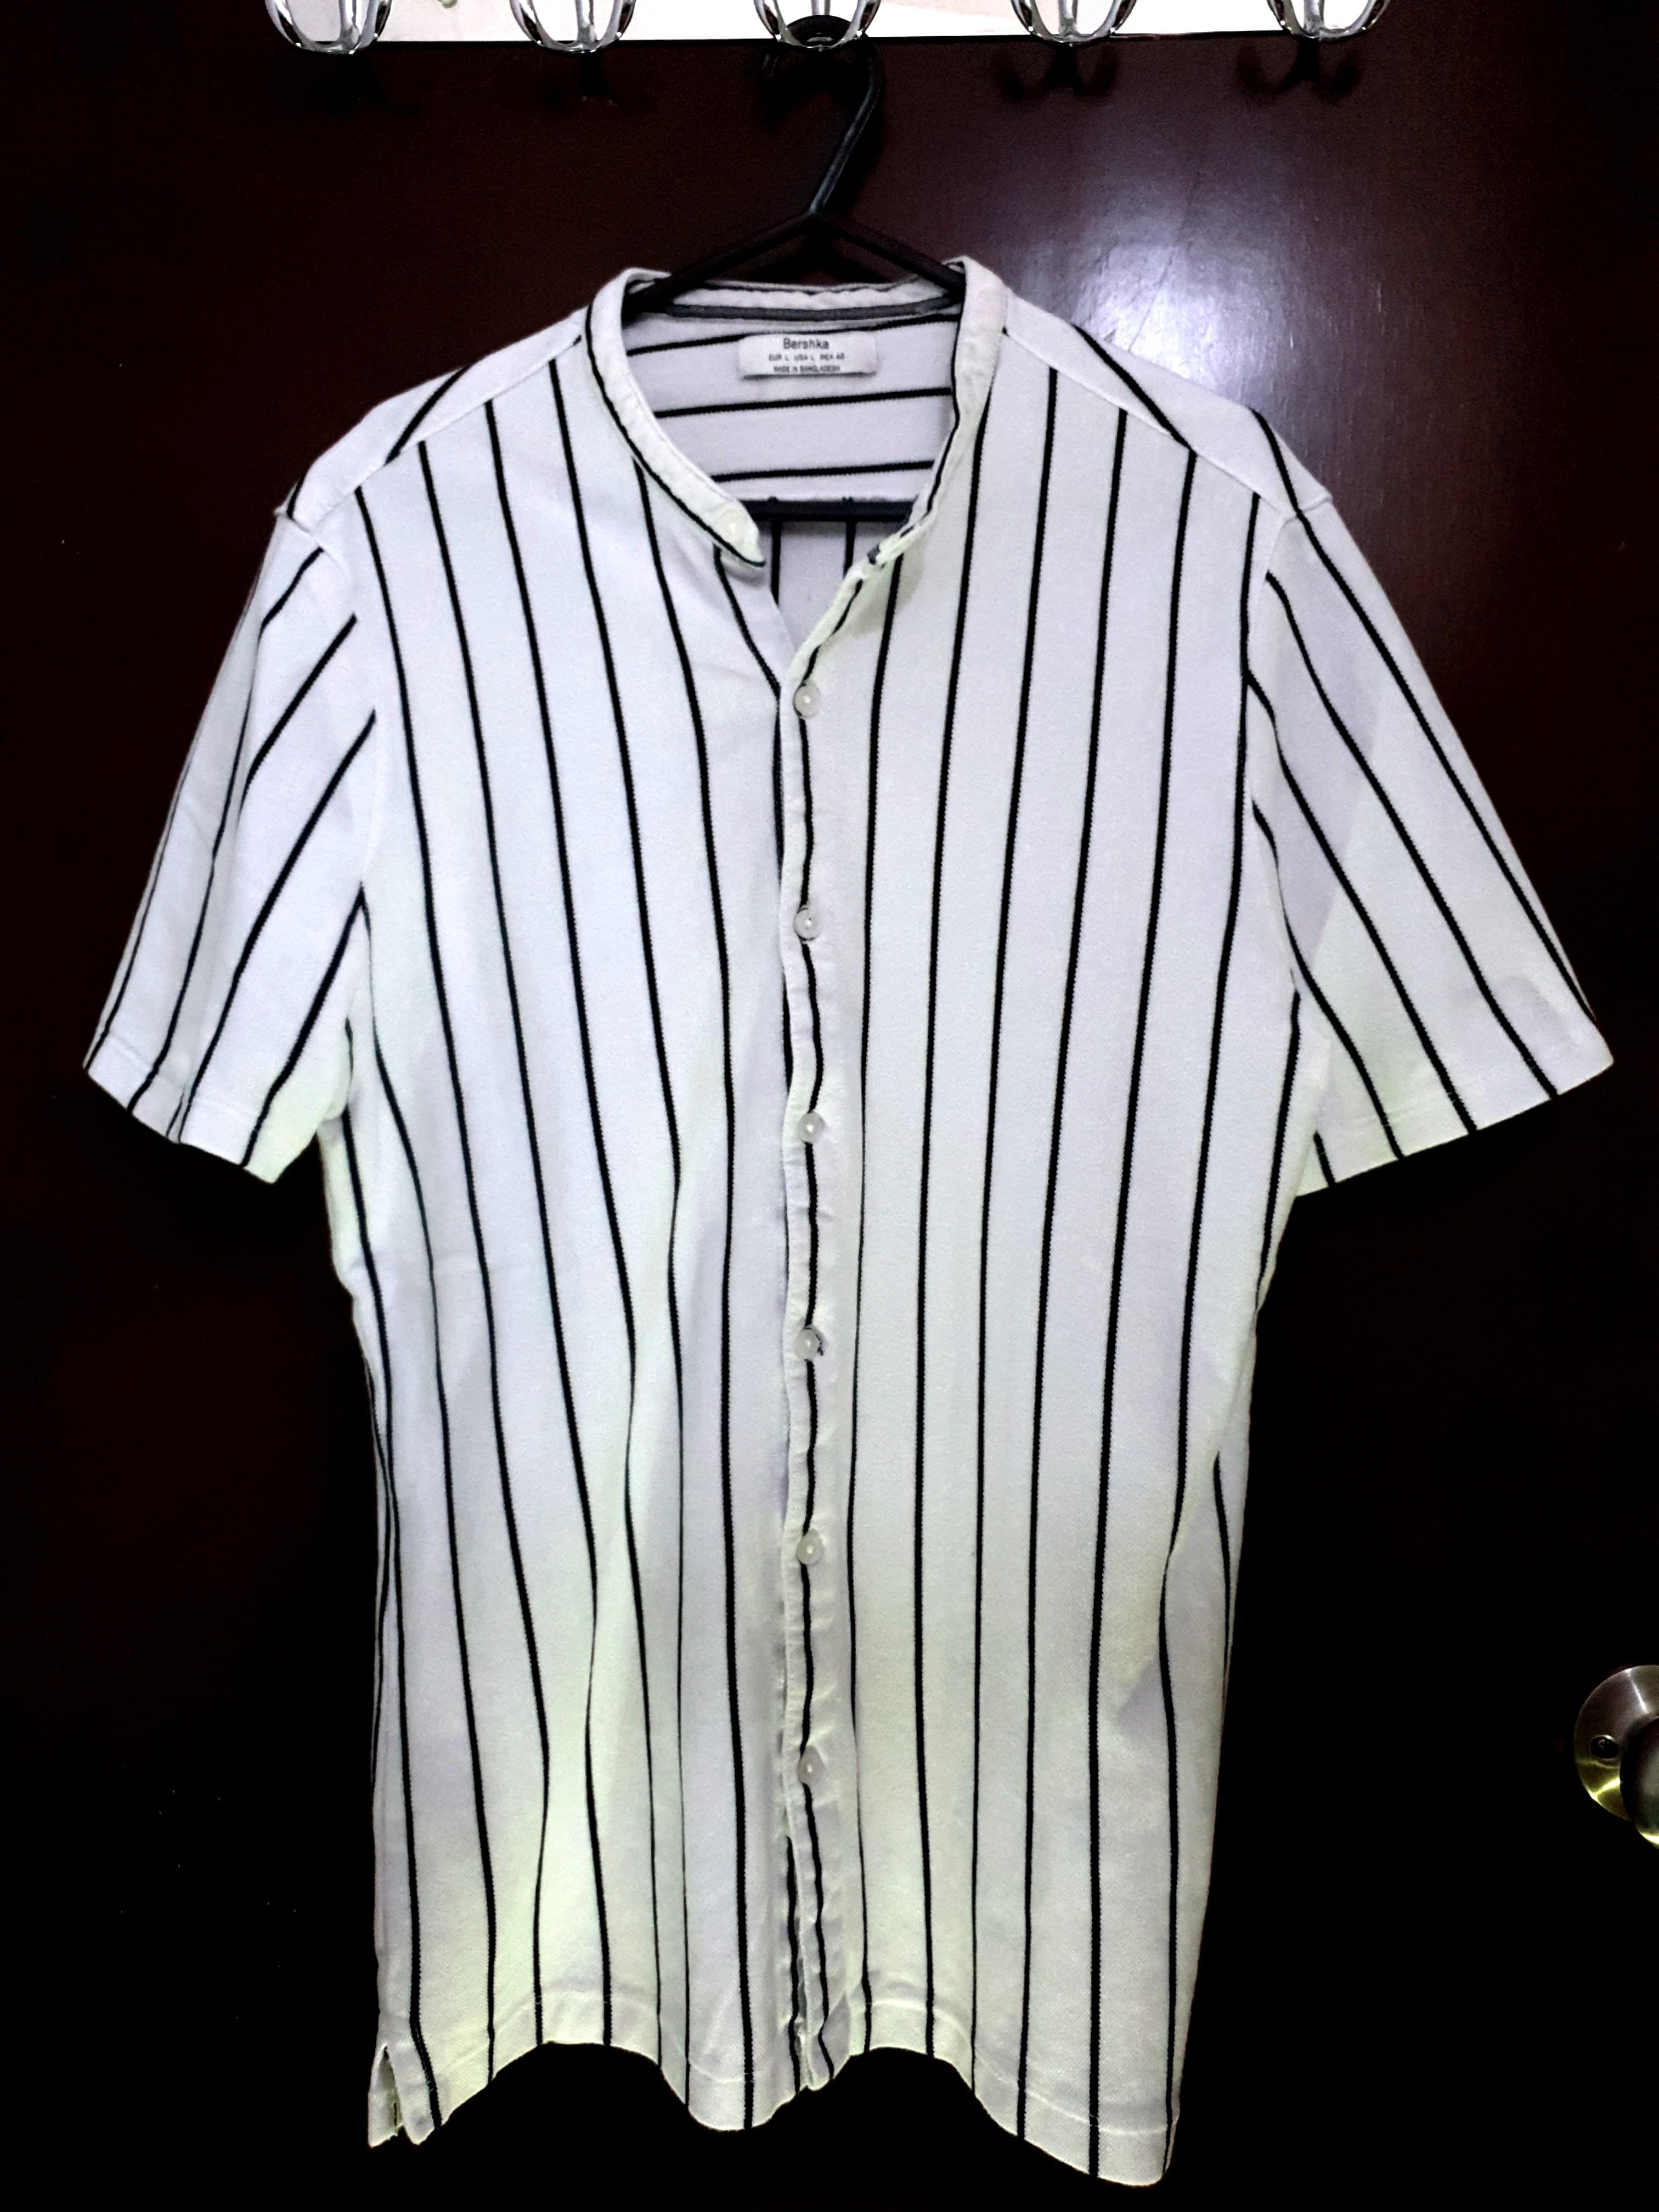 Kaos polo warna putih motif garis garis